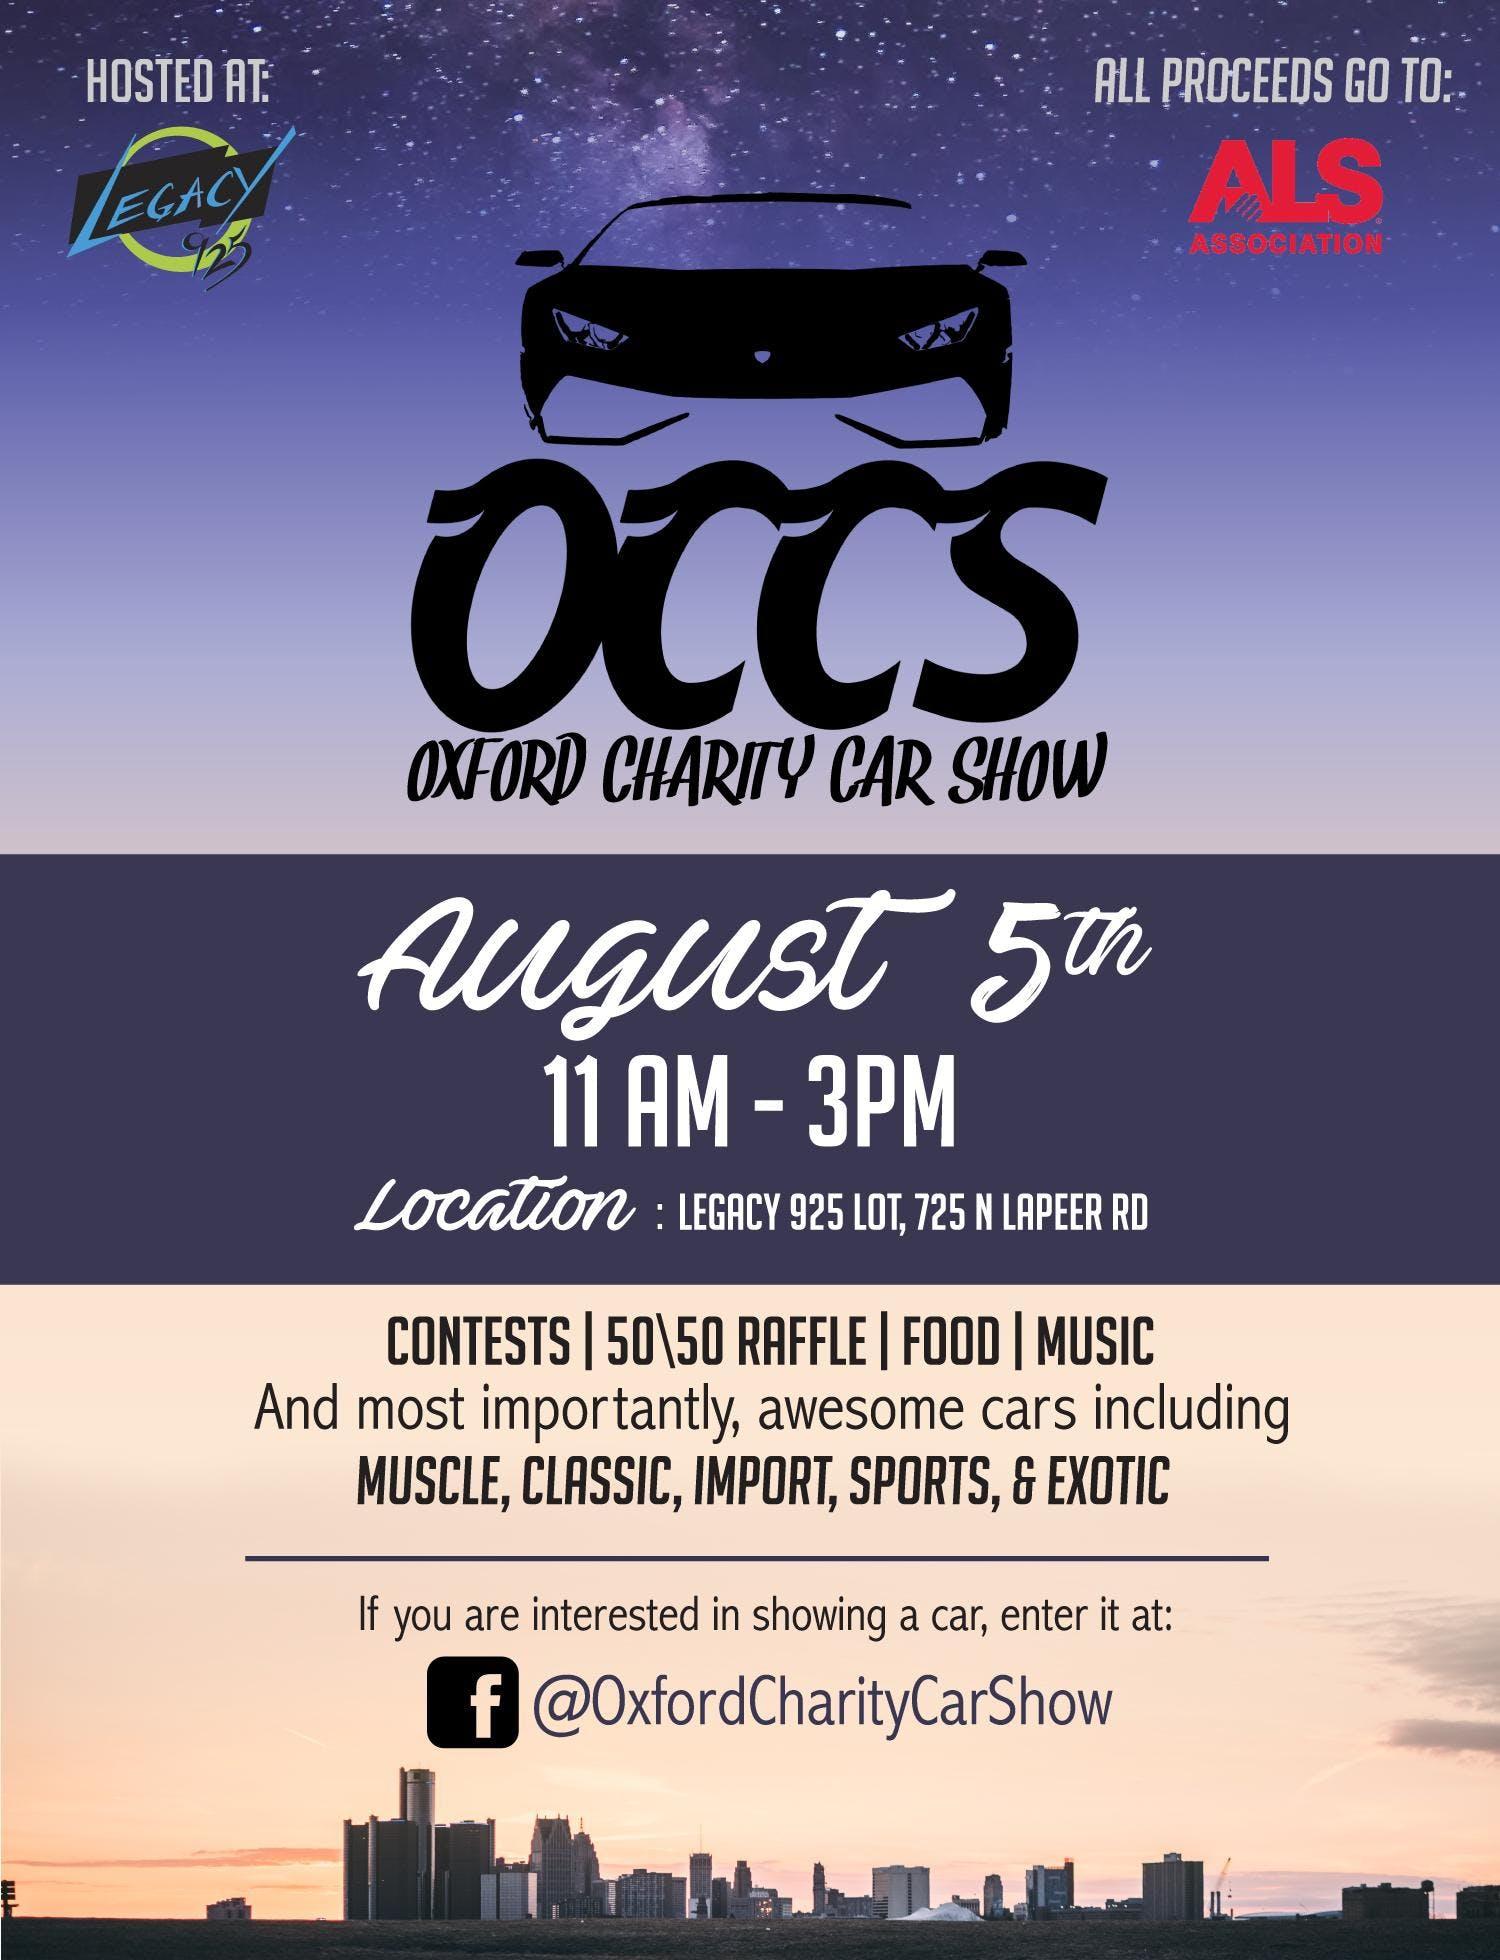 Oxford Charity Car Show AUG - Detroit car show august 2018